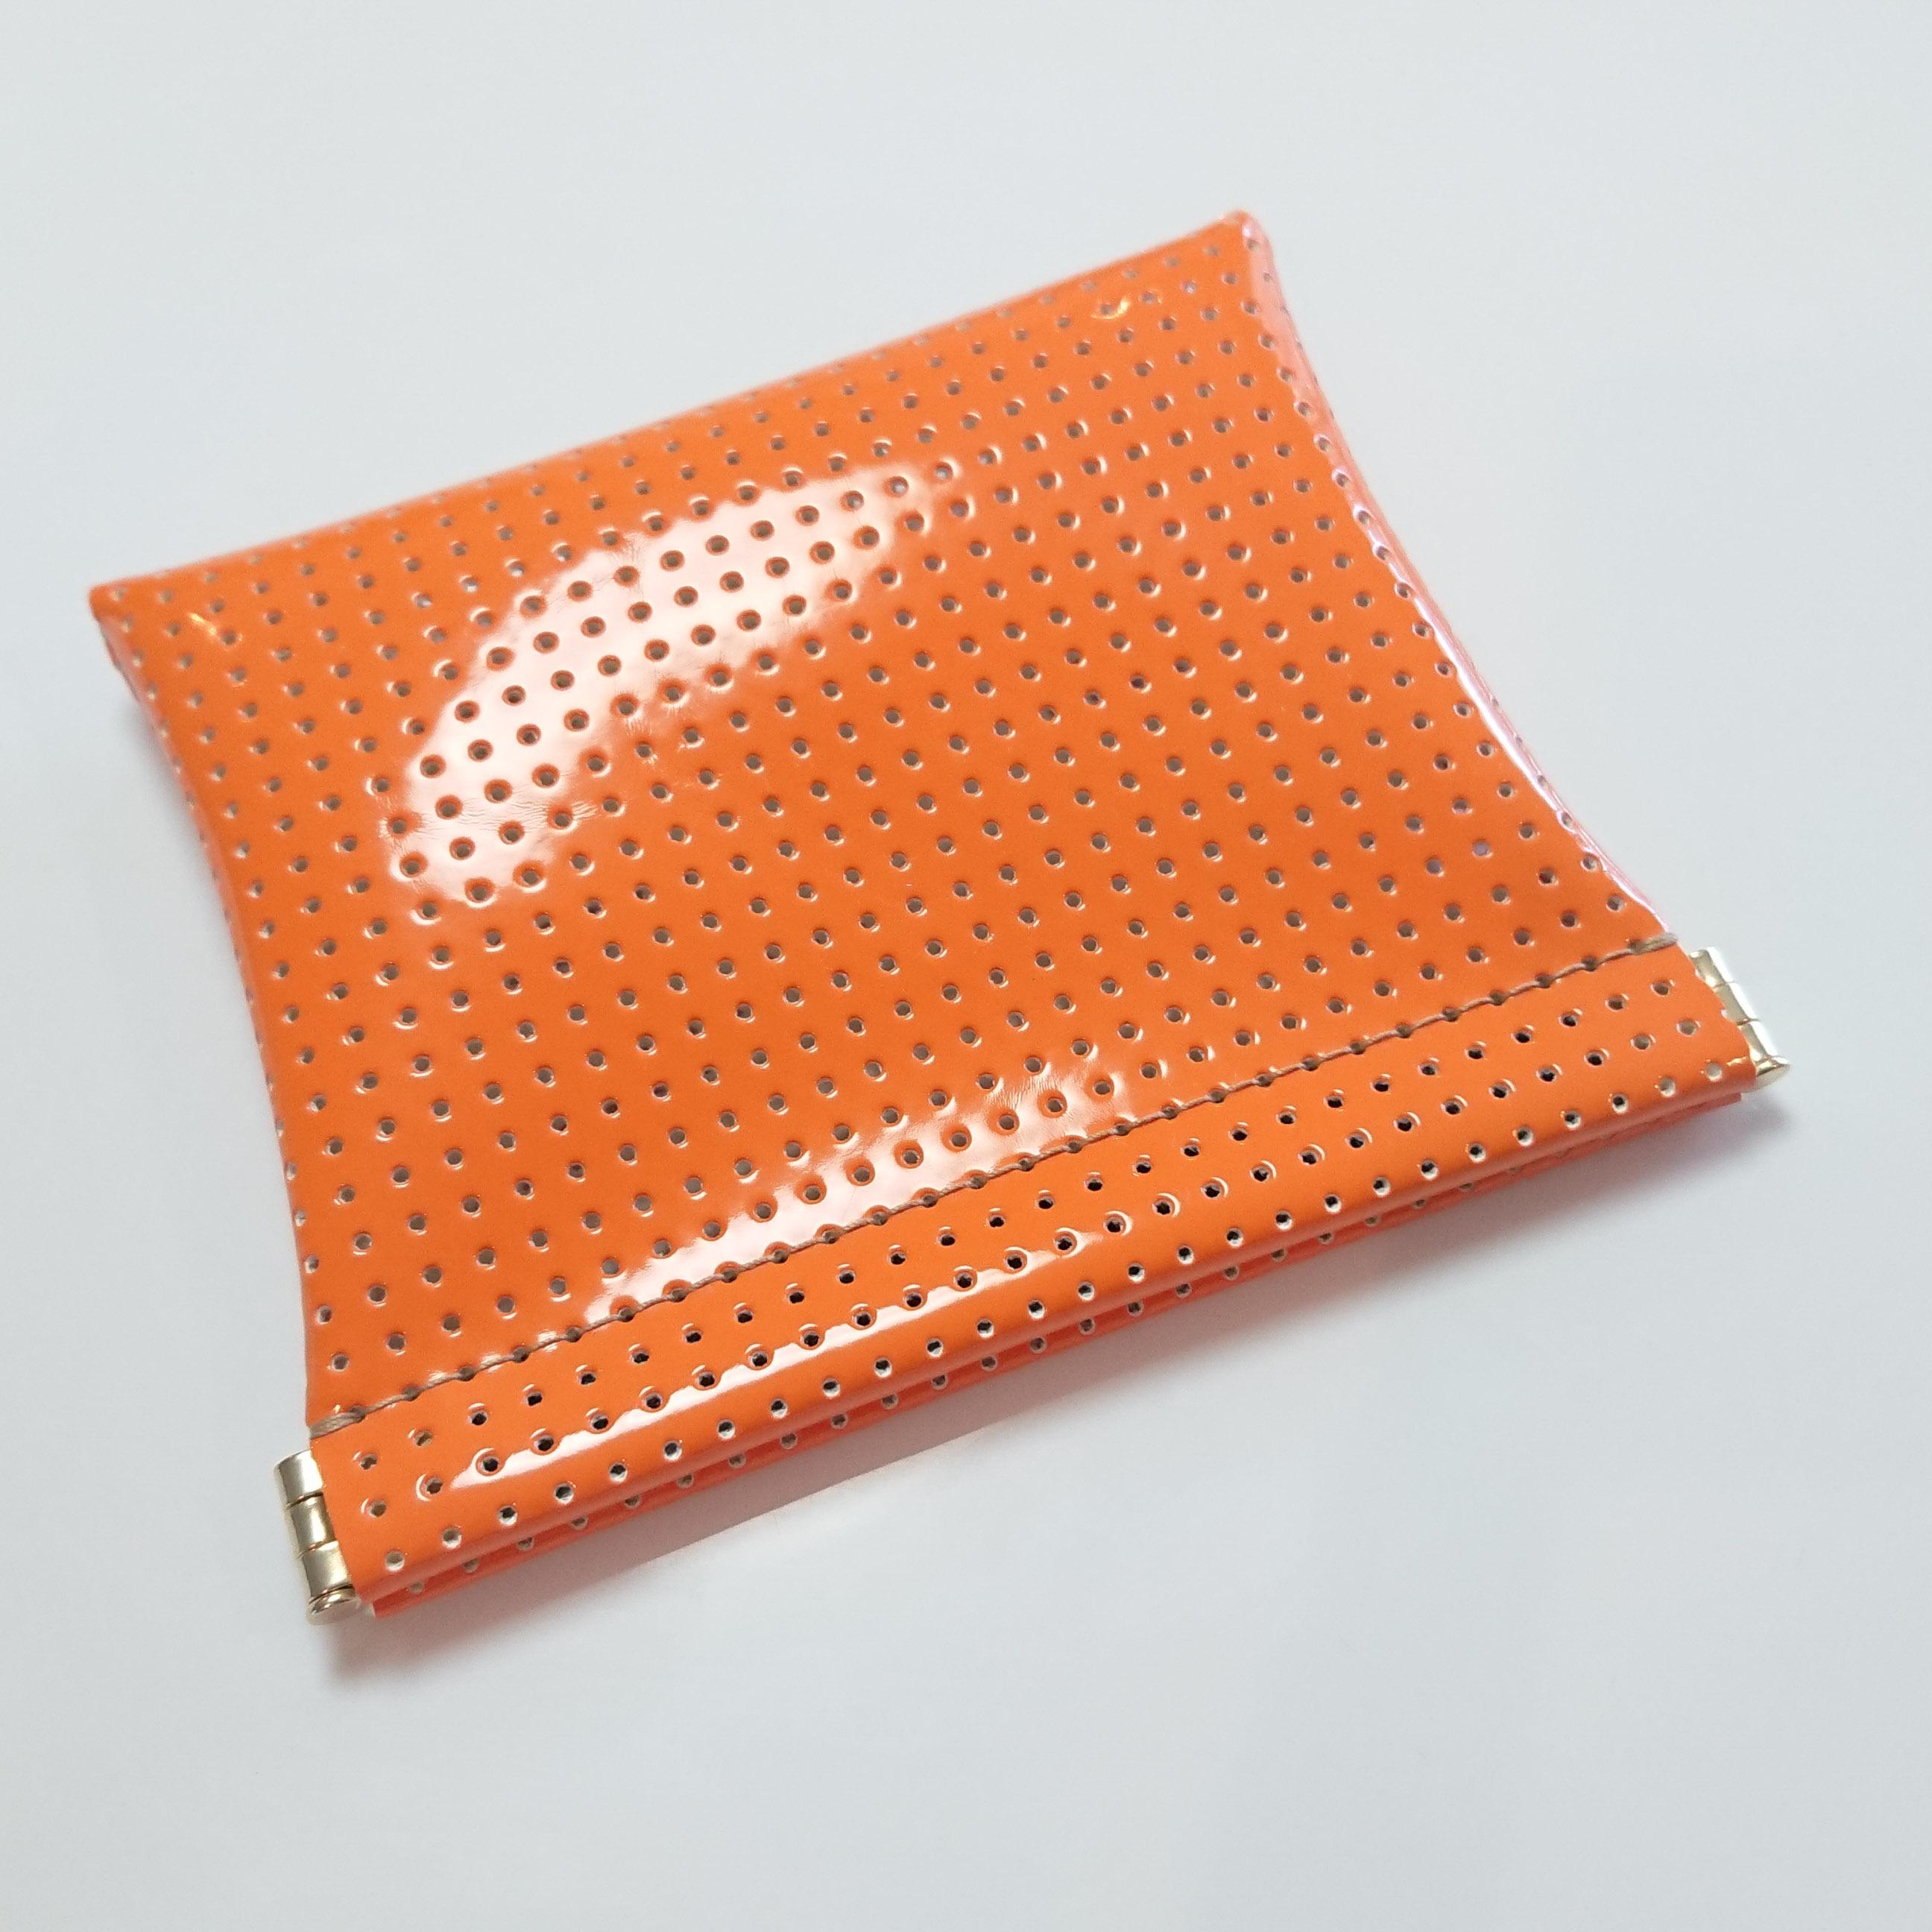 OSORO ポーチ ☆ みかん 薄い財布 ティーケース